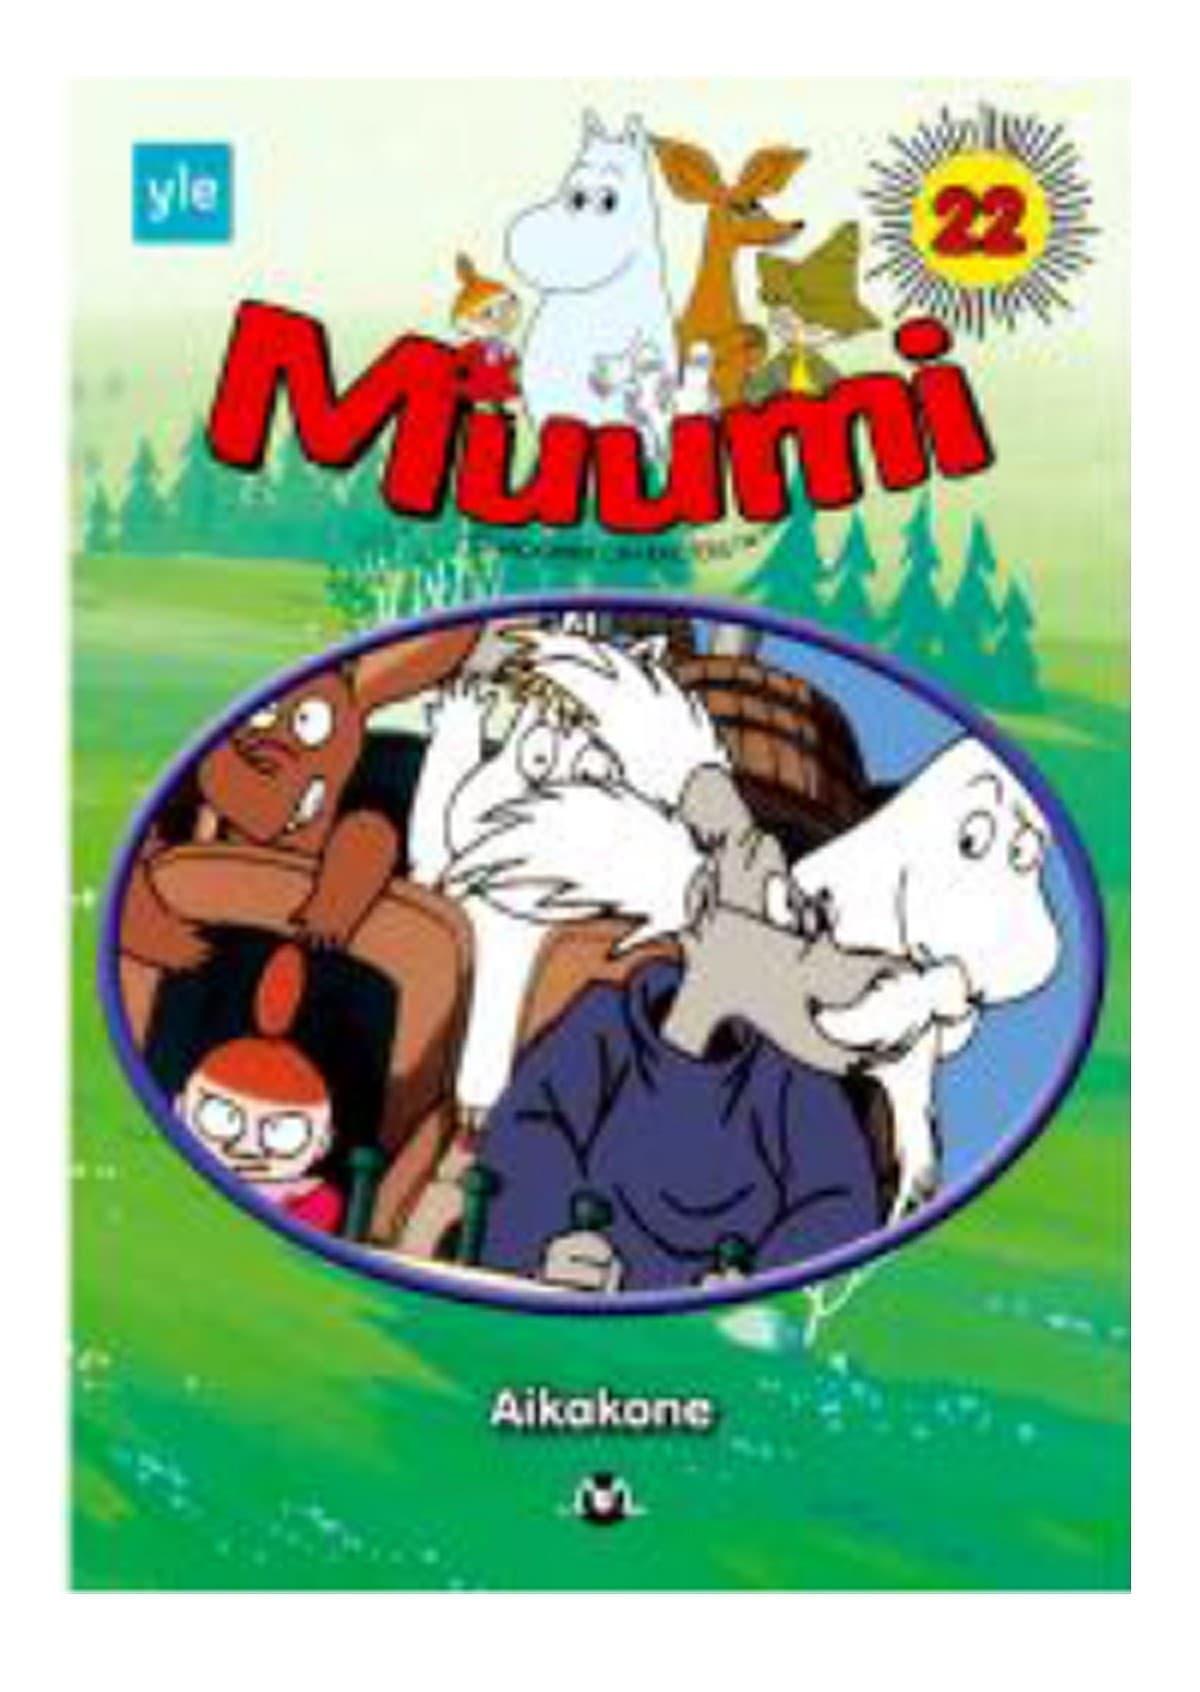 Moomin - The Time Machine (1995)